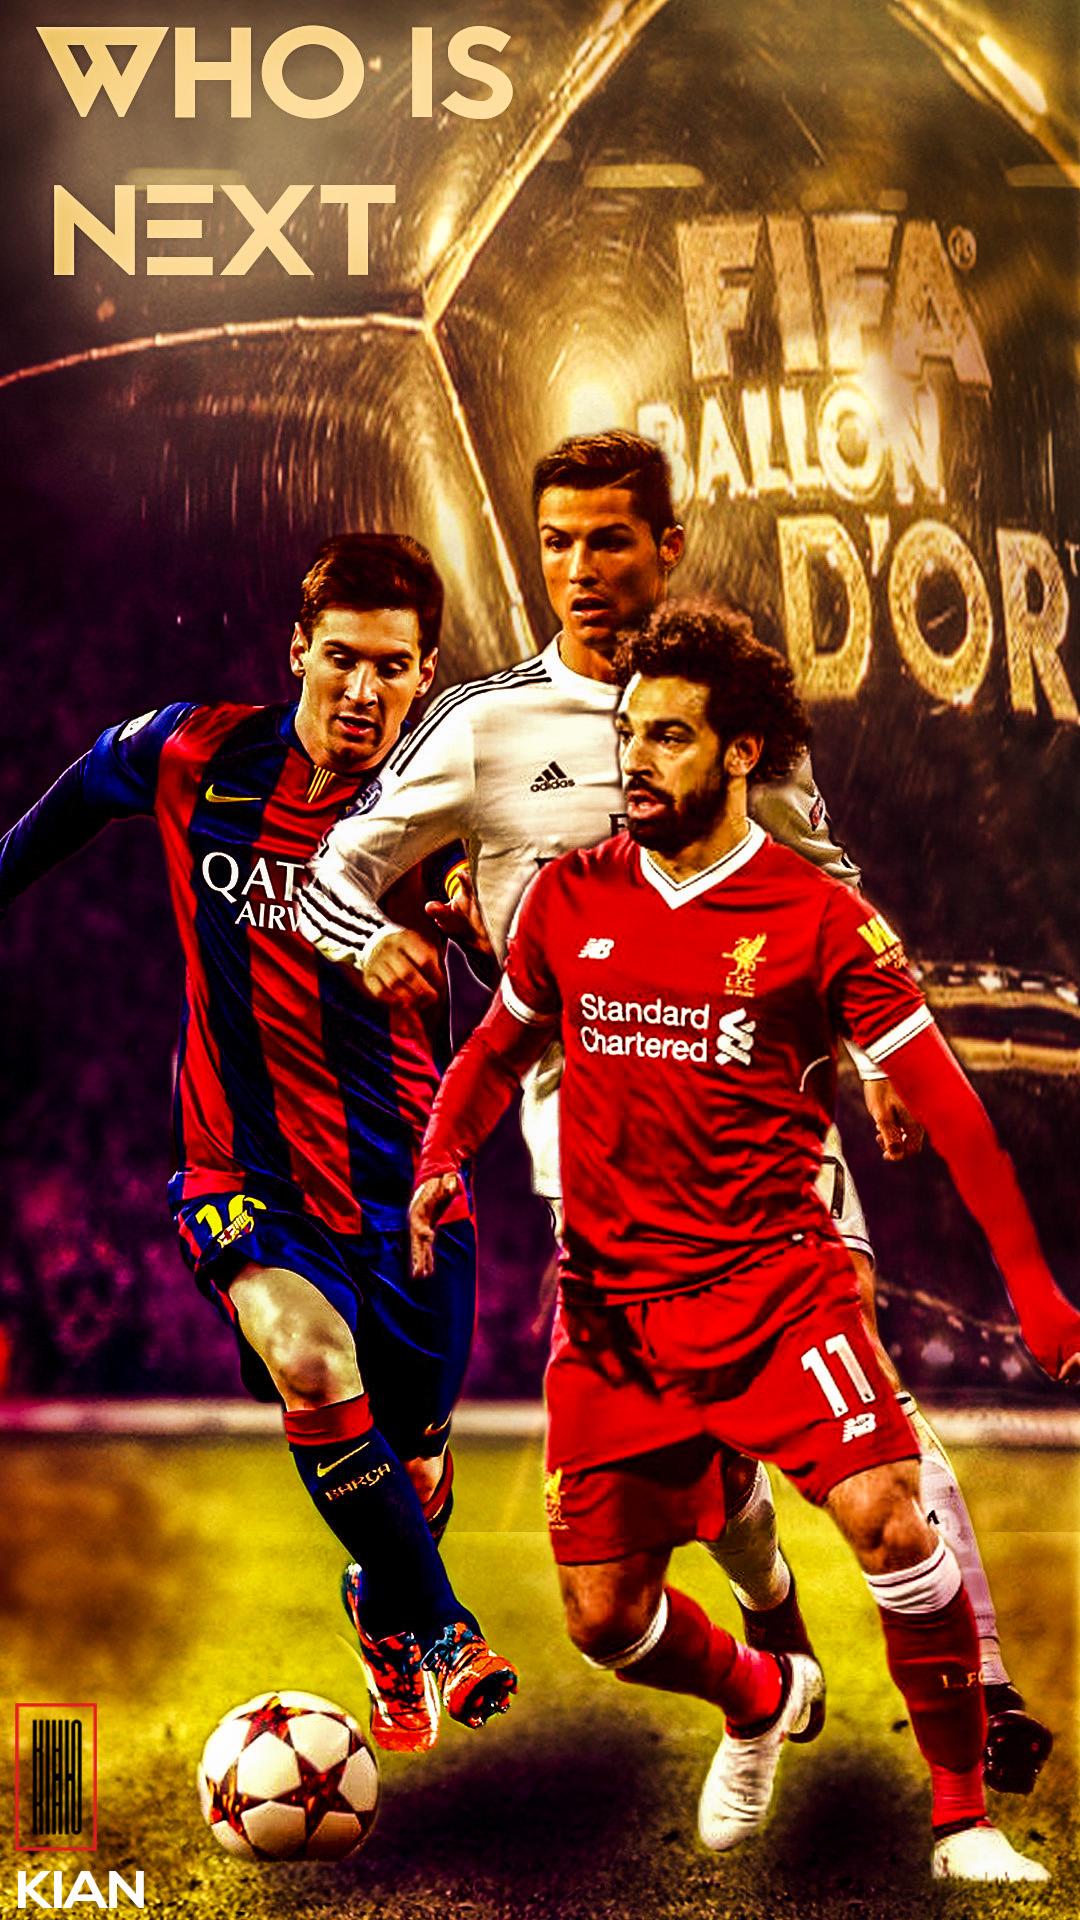 Fondos De Pantalla Ronaldo Lionel Messi Mohamed Salah